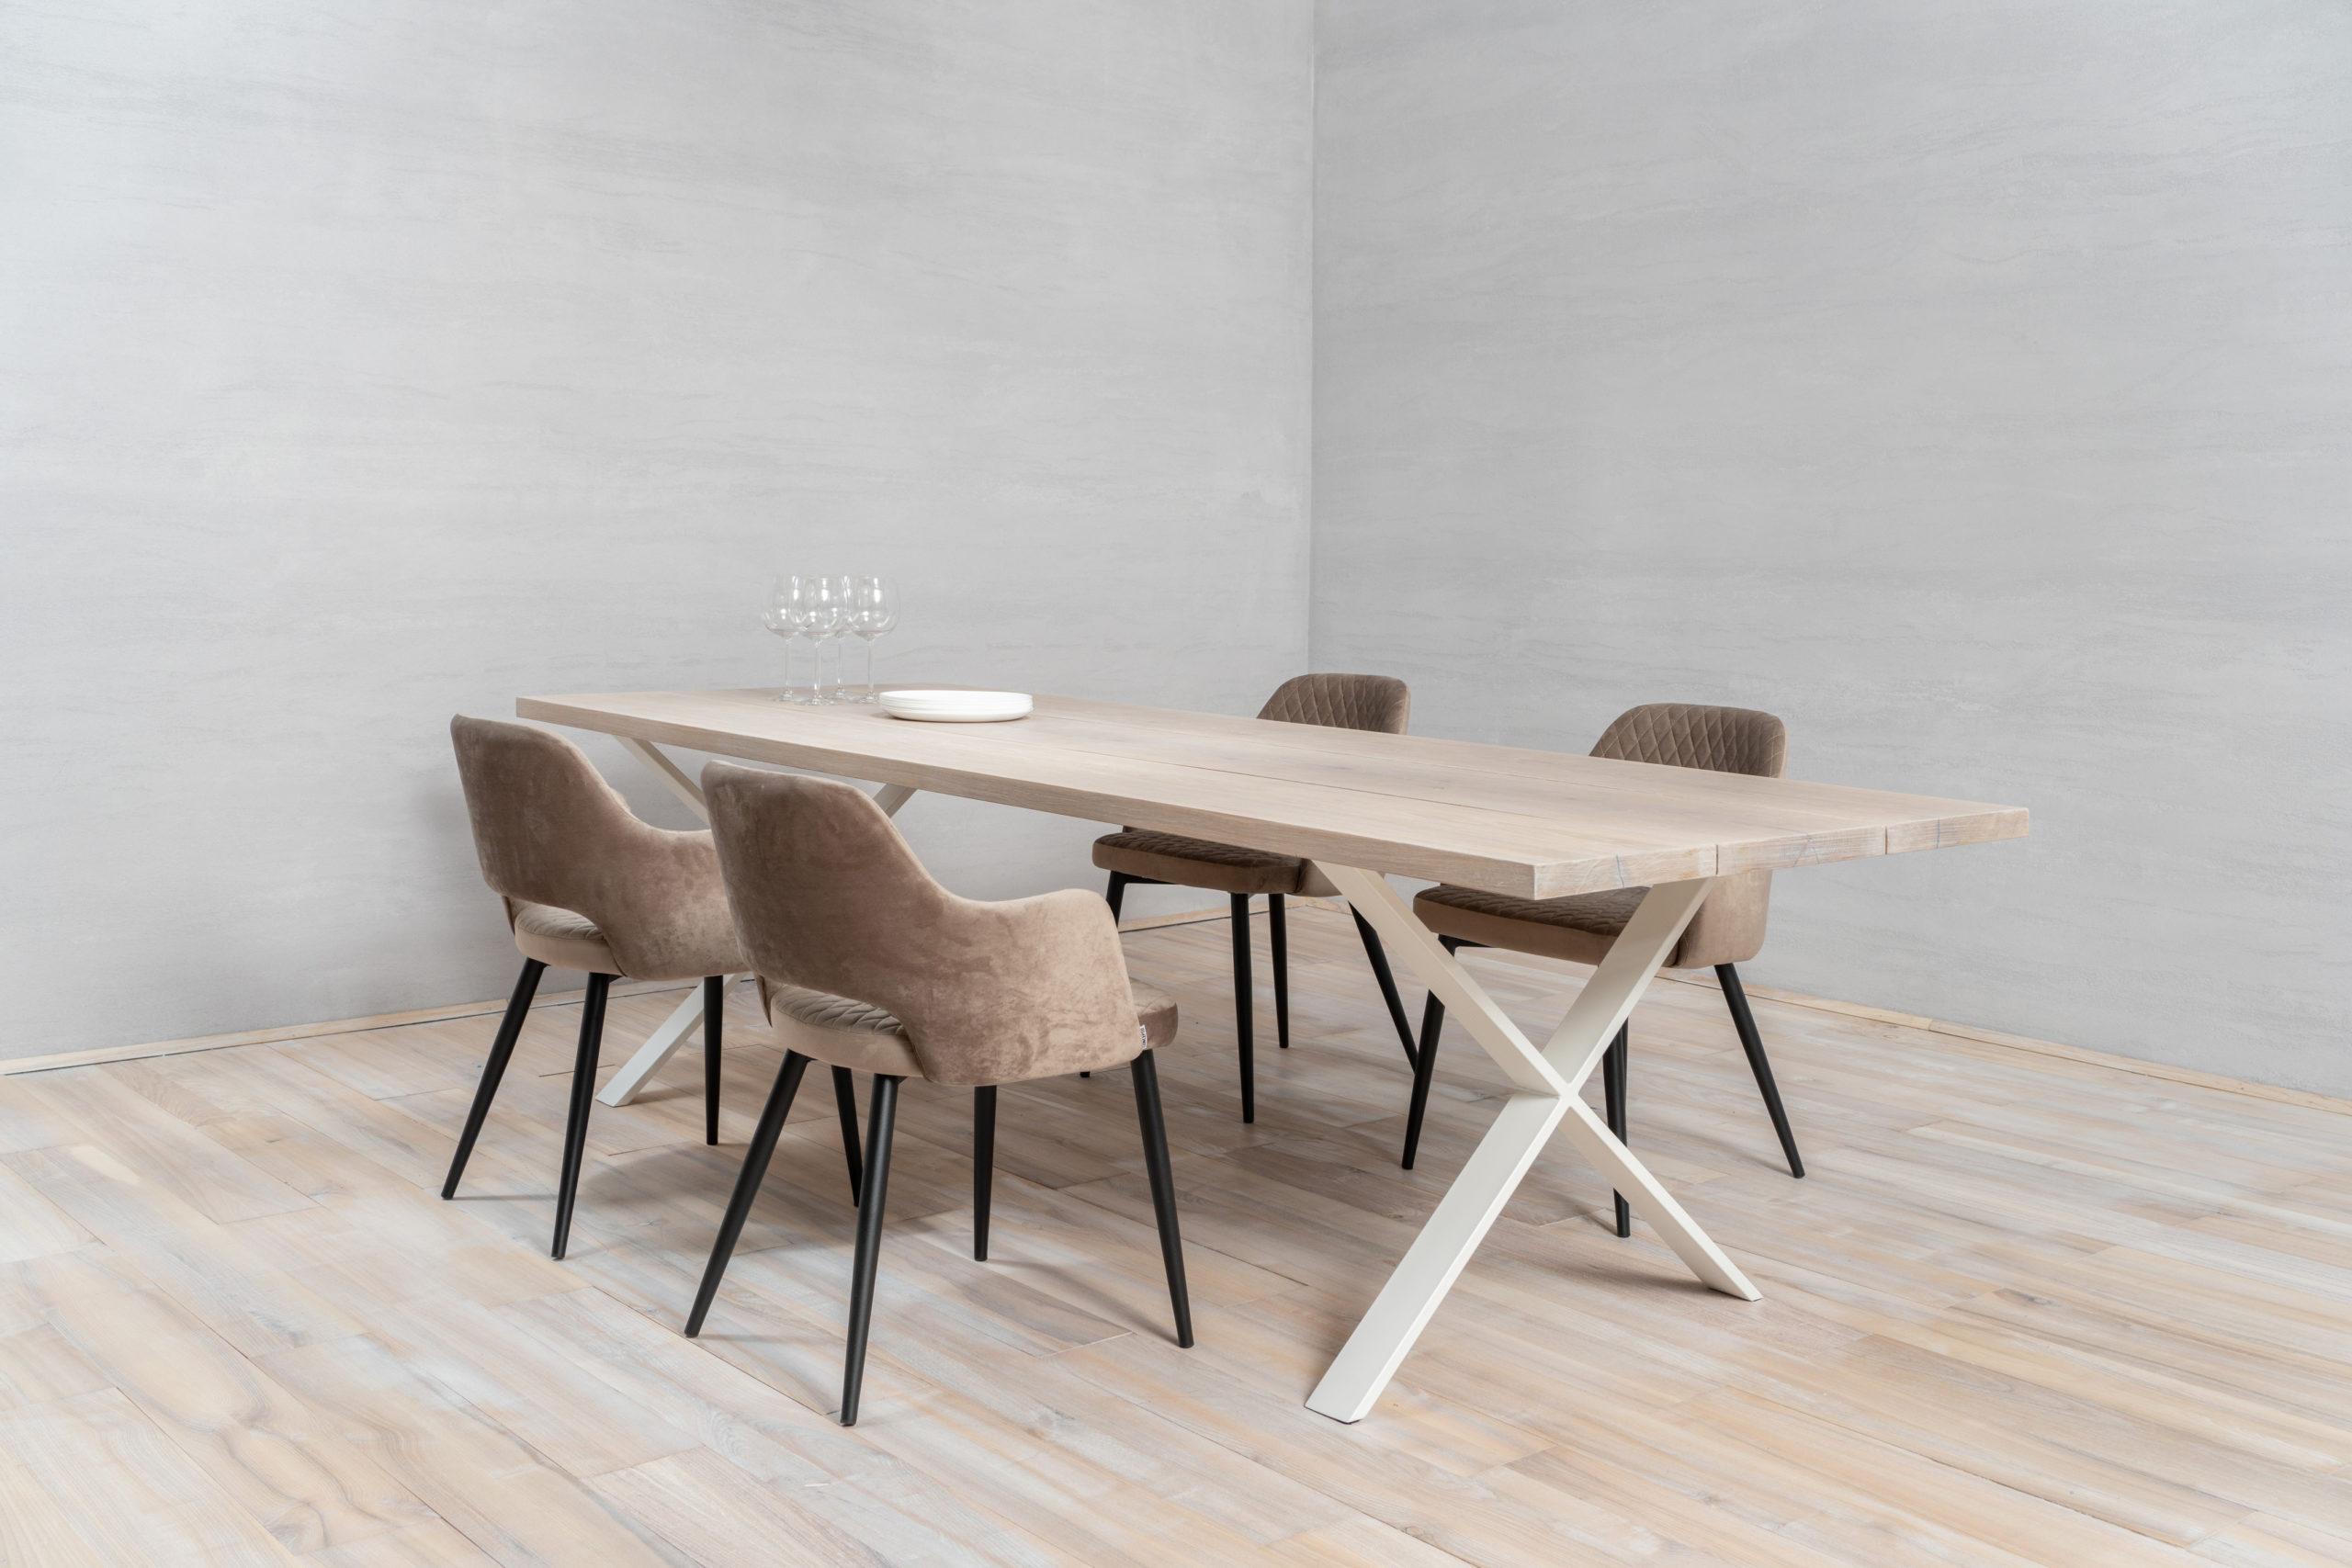 Oak TableTops 3 planks